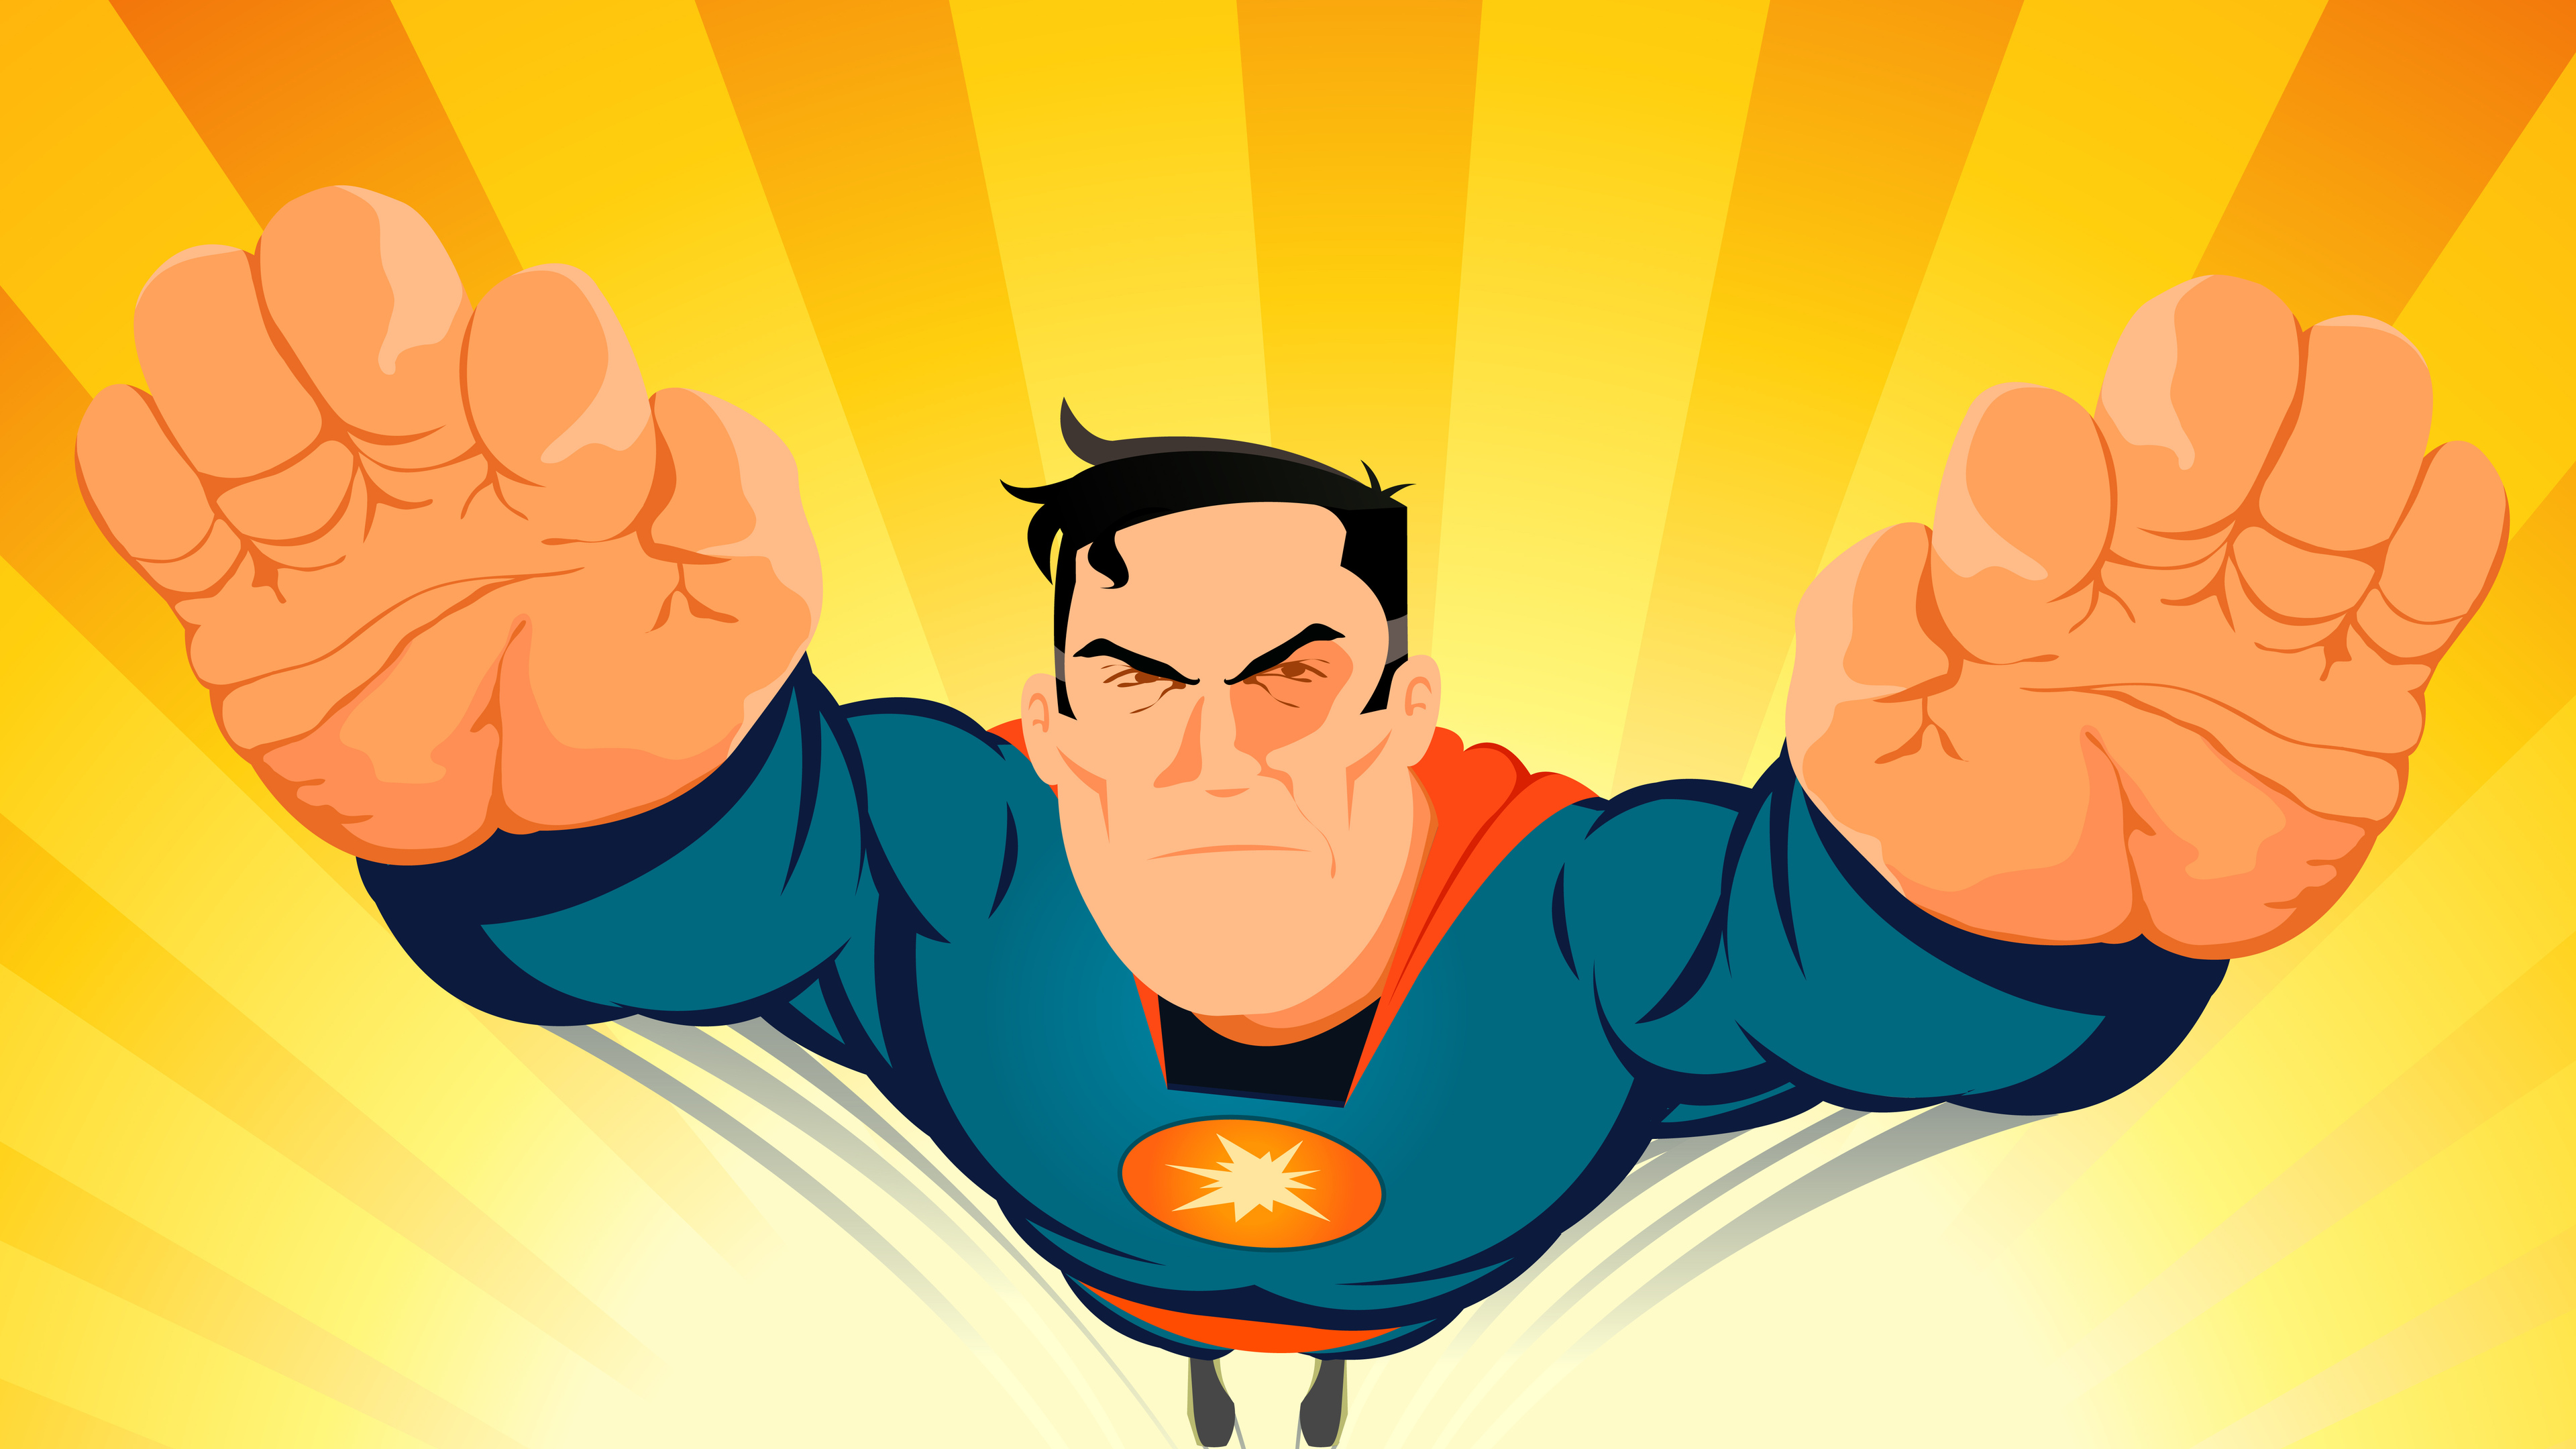 superman art 4k 1553072035 - Superman Art 4k - superman wallpapers, superheroes wallpapers, hd-wallpapers, 8k wallpapers, 5k wallpapers, 4k-wallpapers